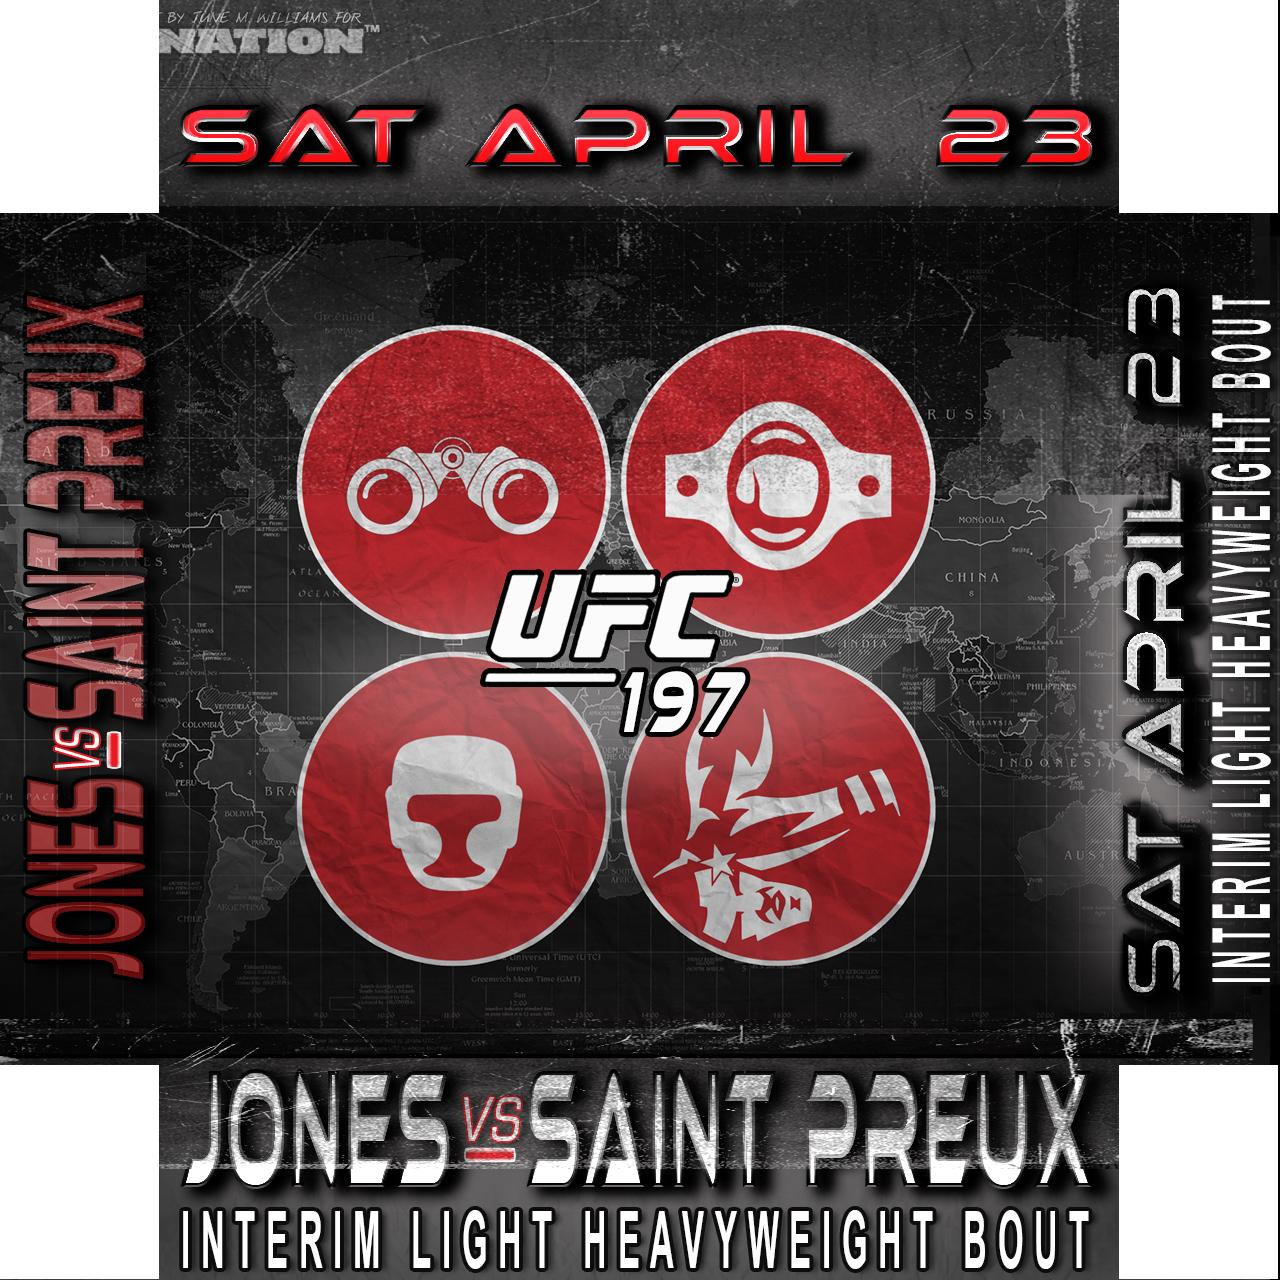 MMA Prospectus, UFC 197, Jones vs St. Preux